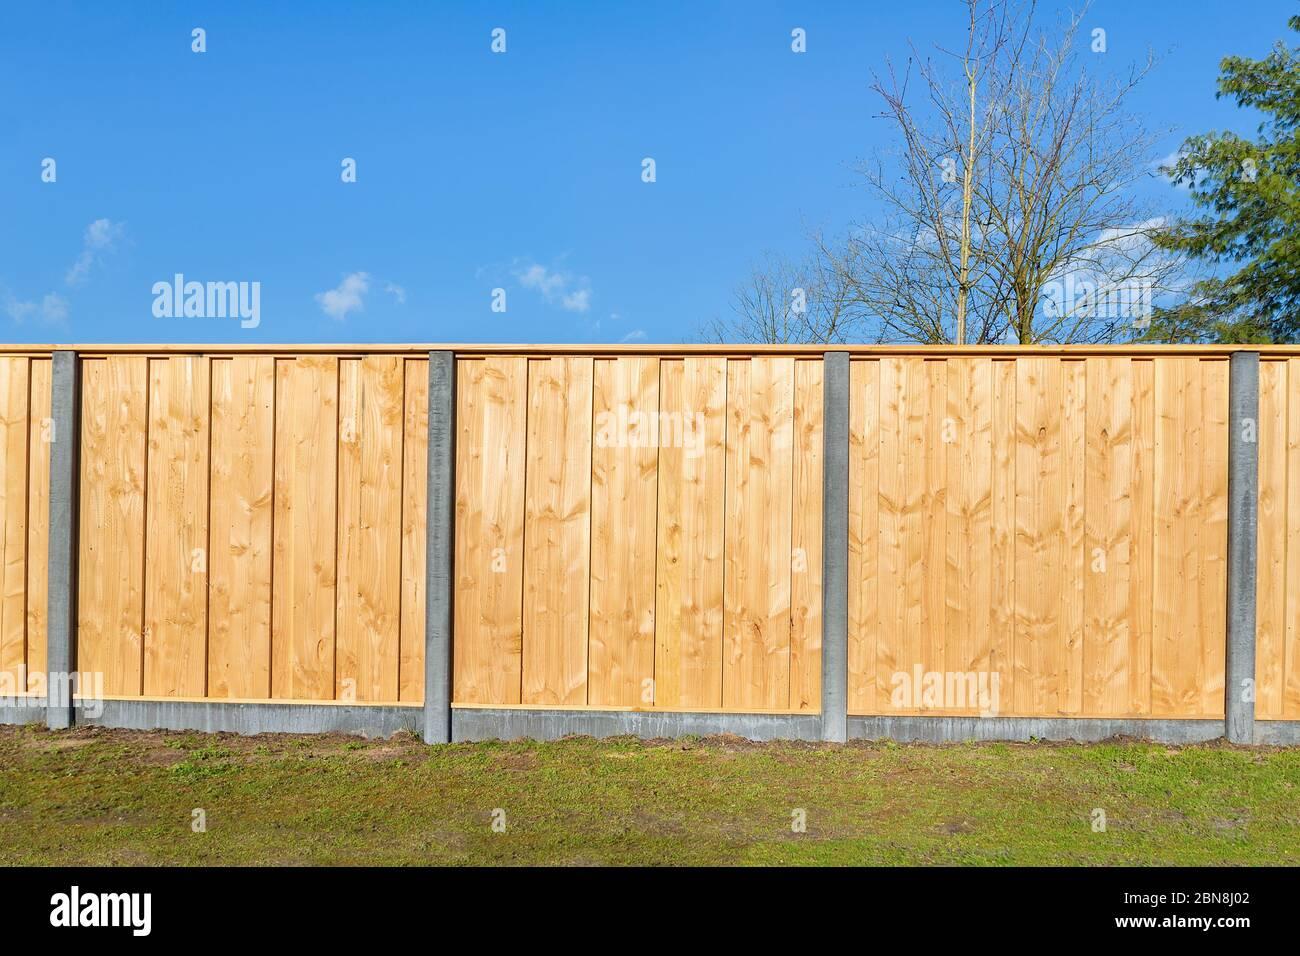 Built New Horizontal Wooden Fence Construction In Dutch Backyard Stock Photo Alamy